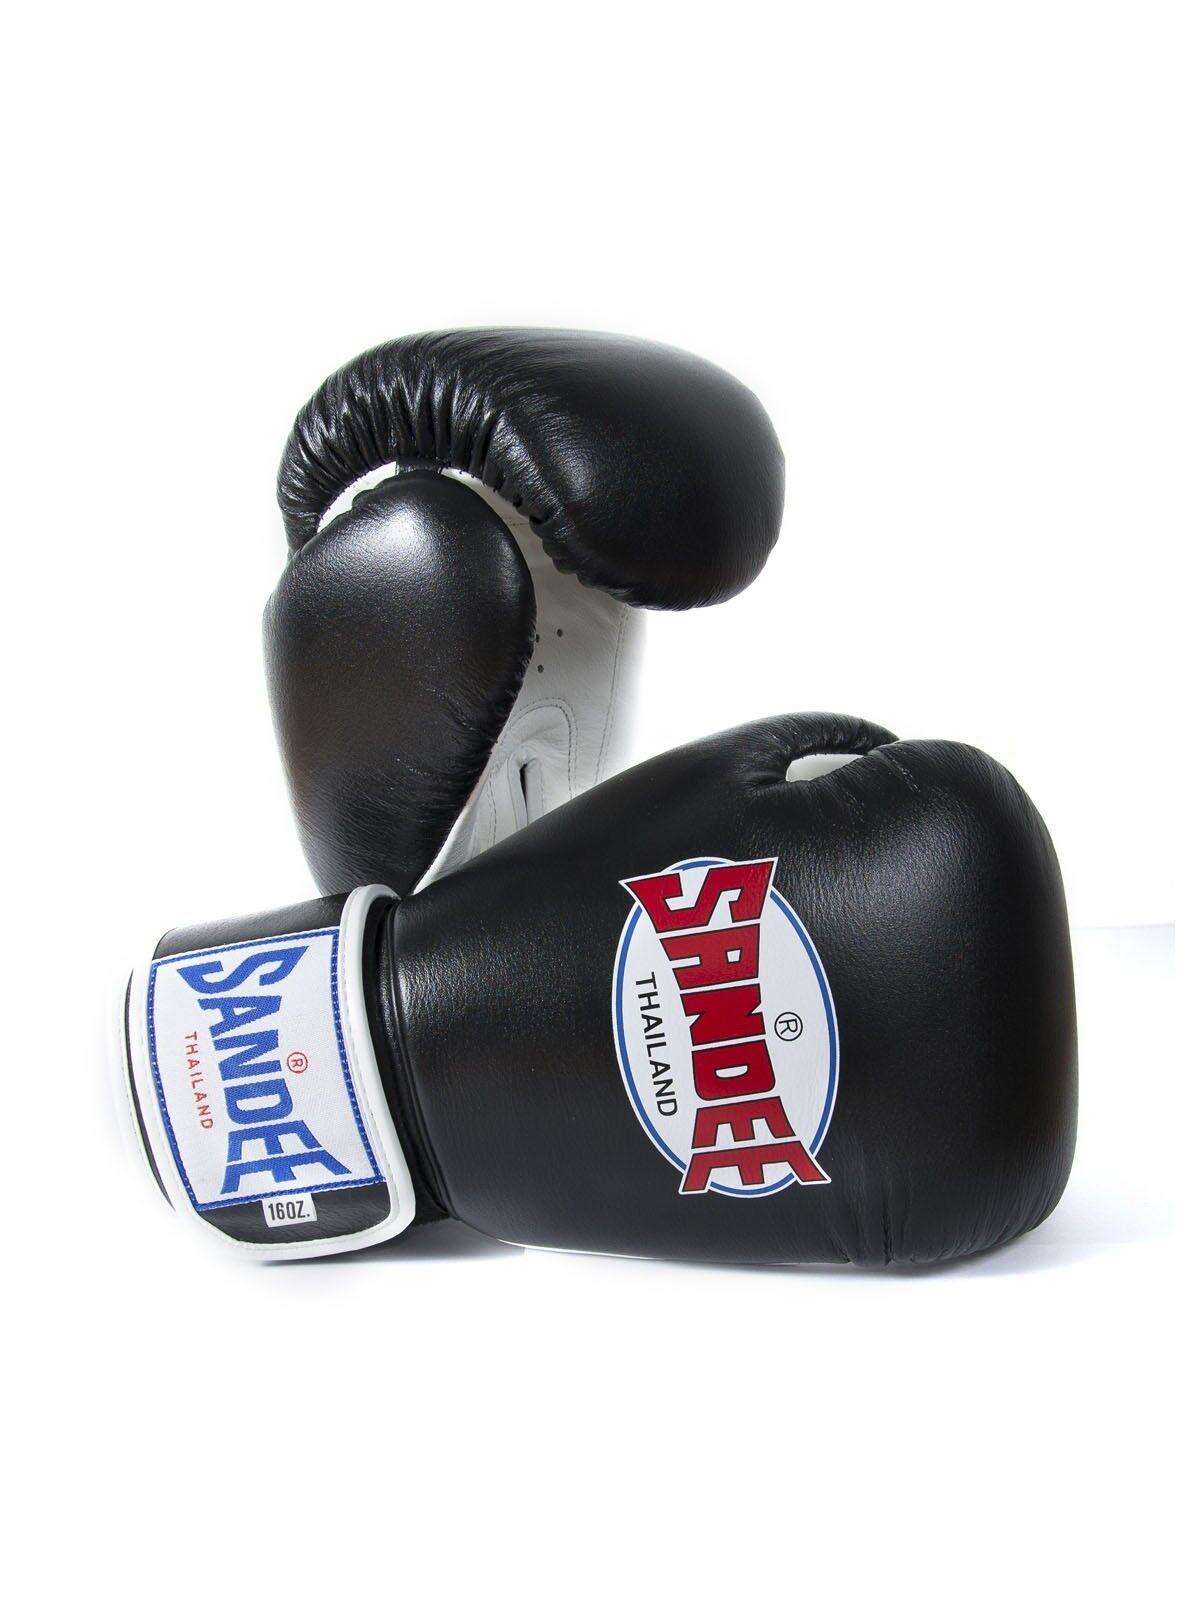 Sandee Sport Boxing Gloves Black White Muay Thai Kickboxing MMA K1 Striking Sold by MinotaurFightStore